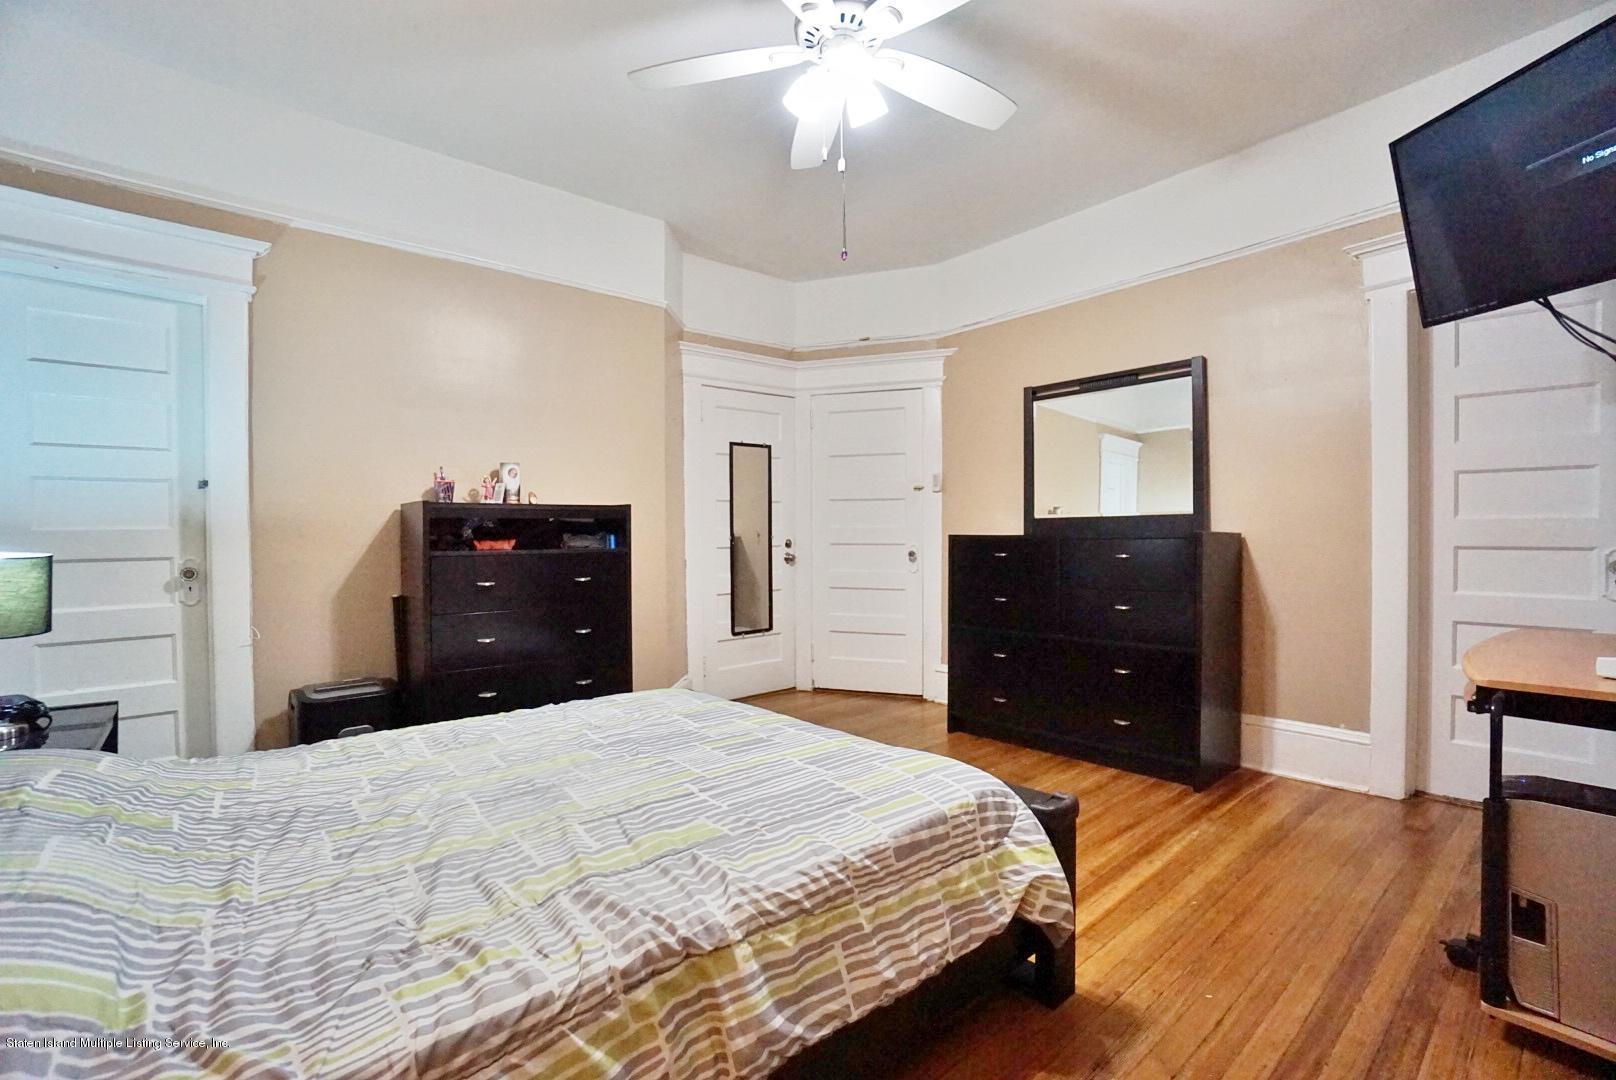 Single Family - Detached 31 Pelton Avenue  Staten Island, NY 10310, MLS-1132177-20